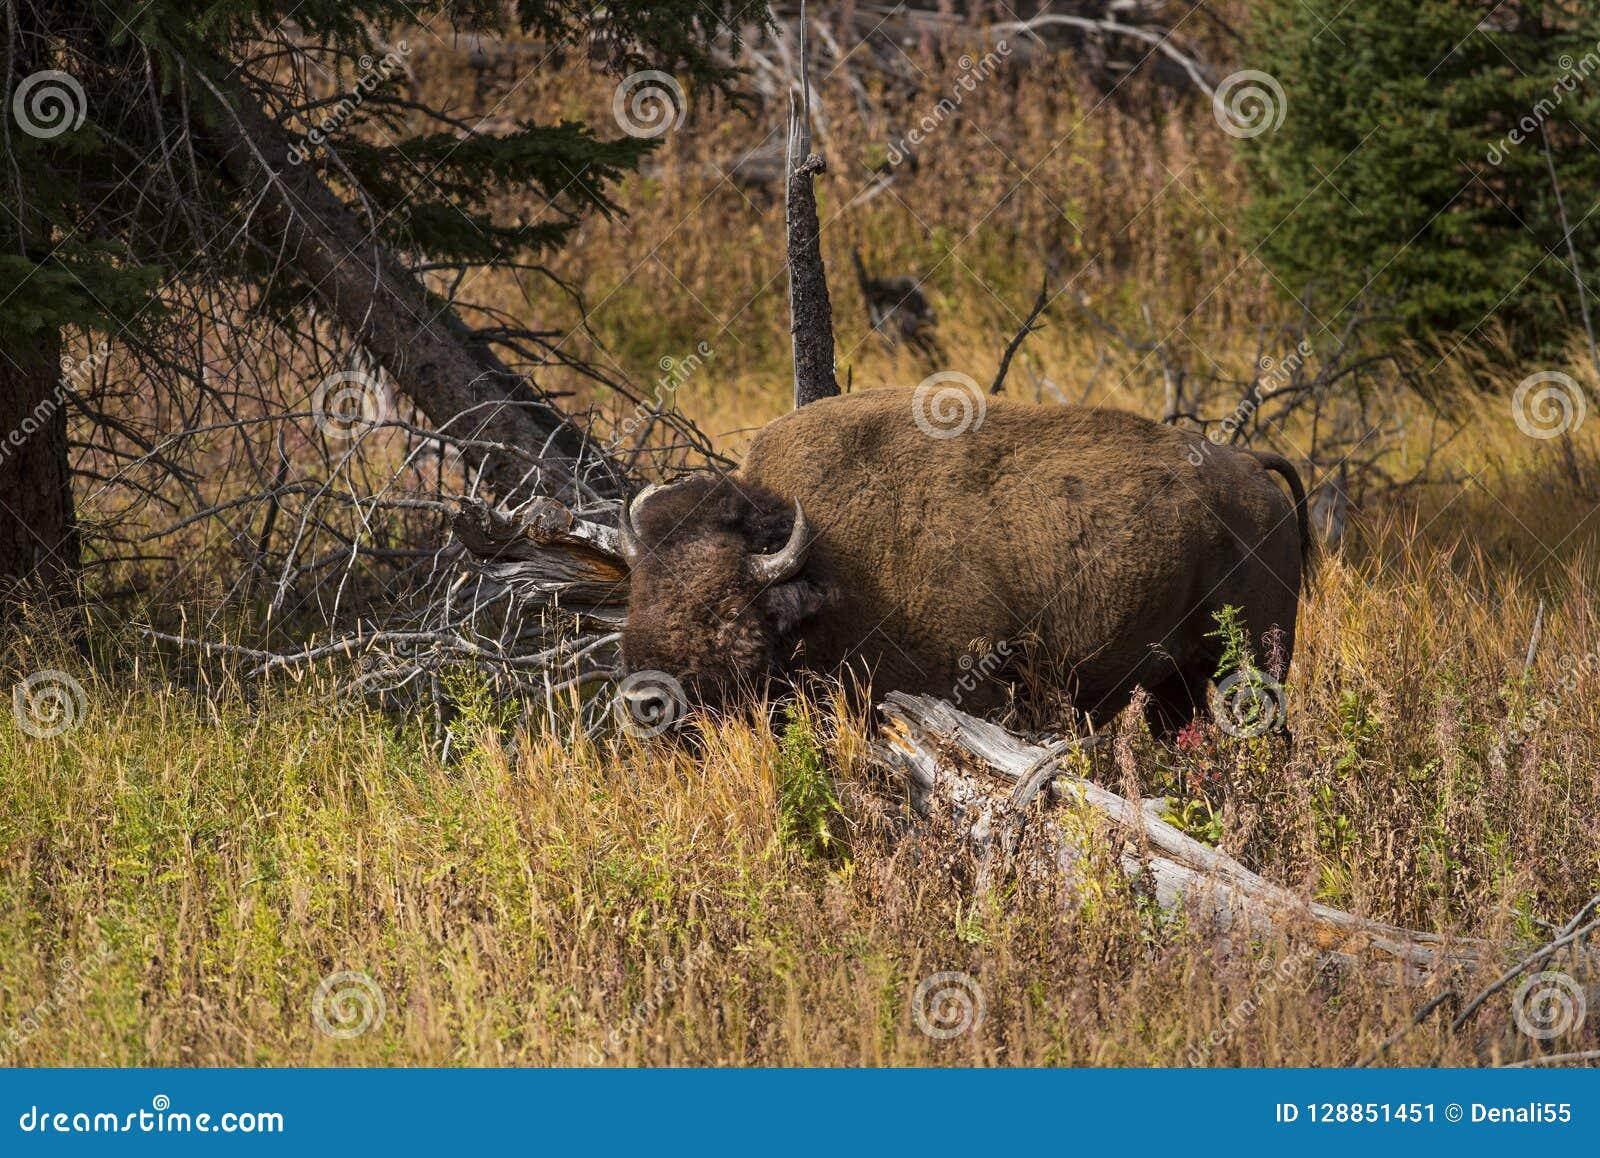 Touro do bisonte que forrageia para o alimento na floresta